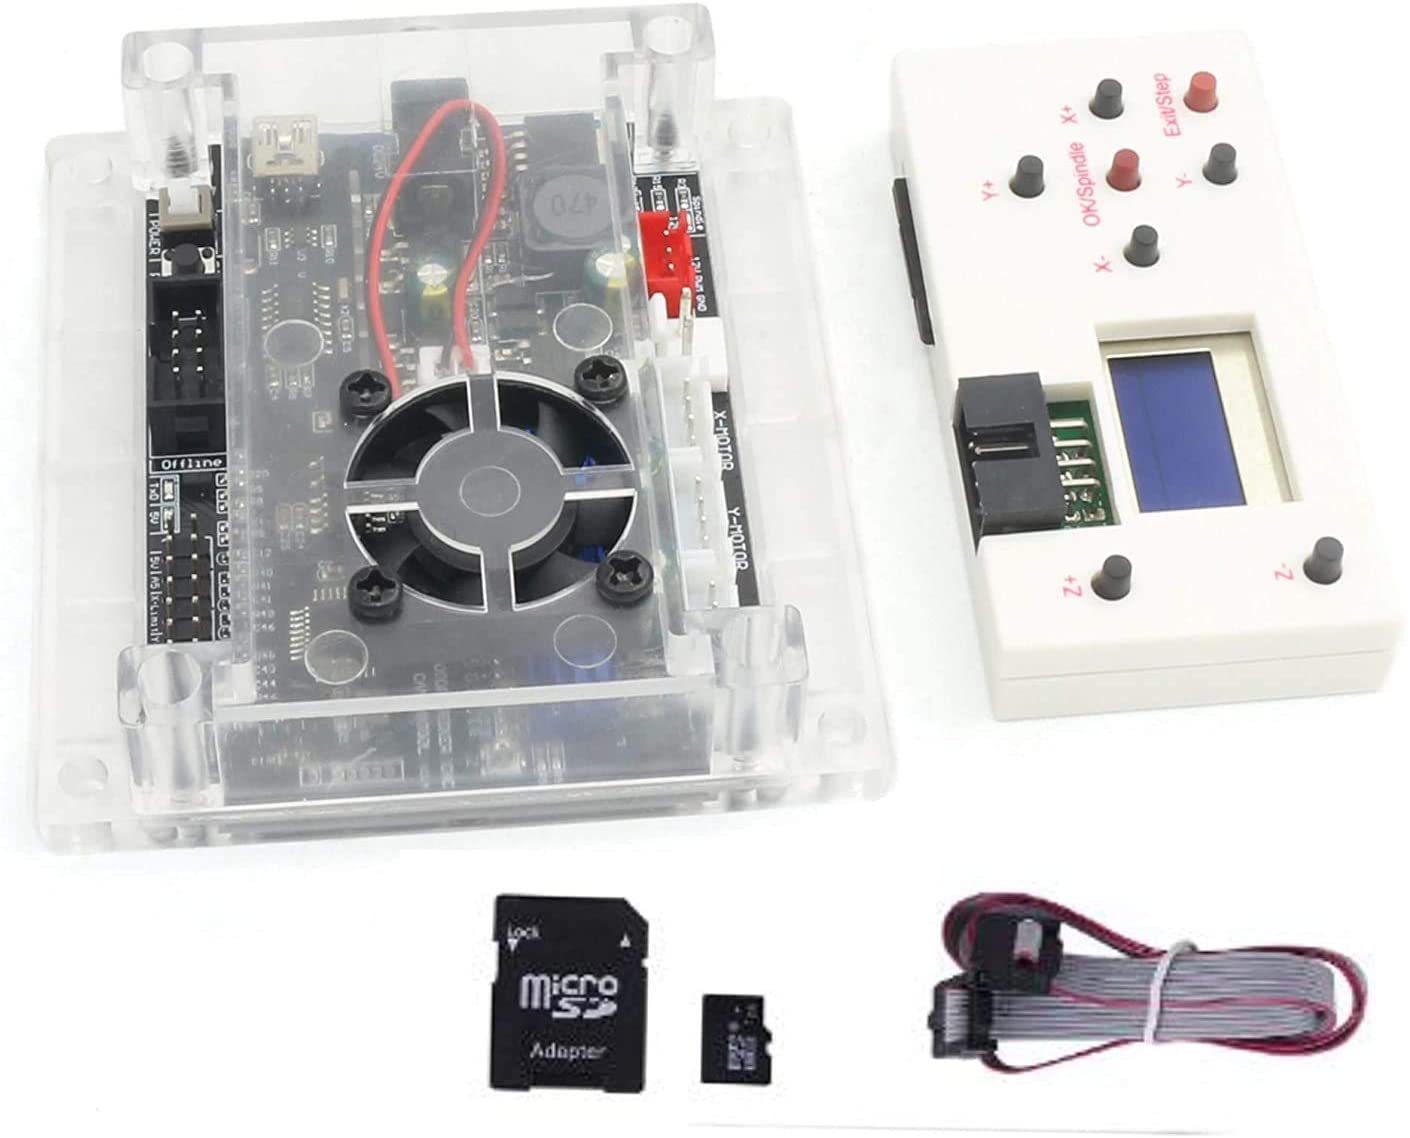 3 Axis 1.1f Laser Control Board USB GRBL Controller